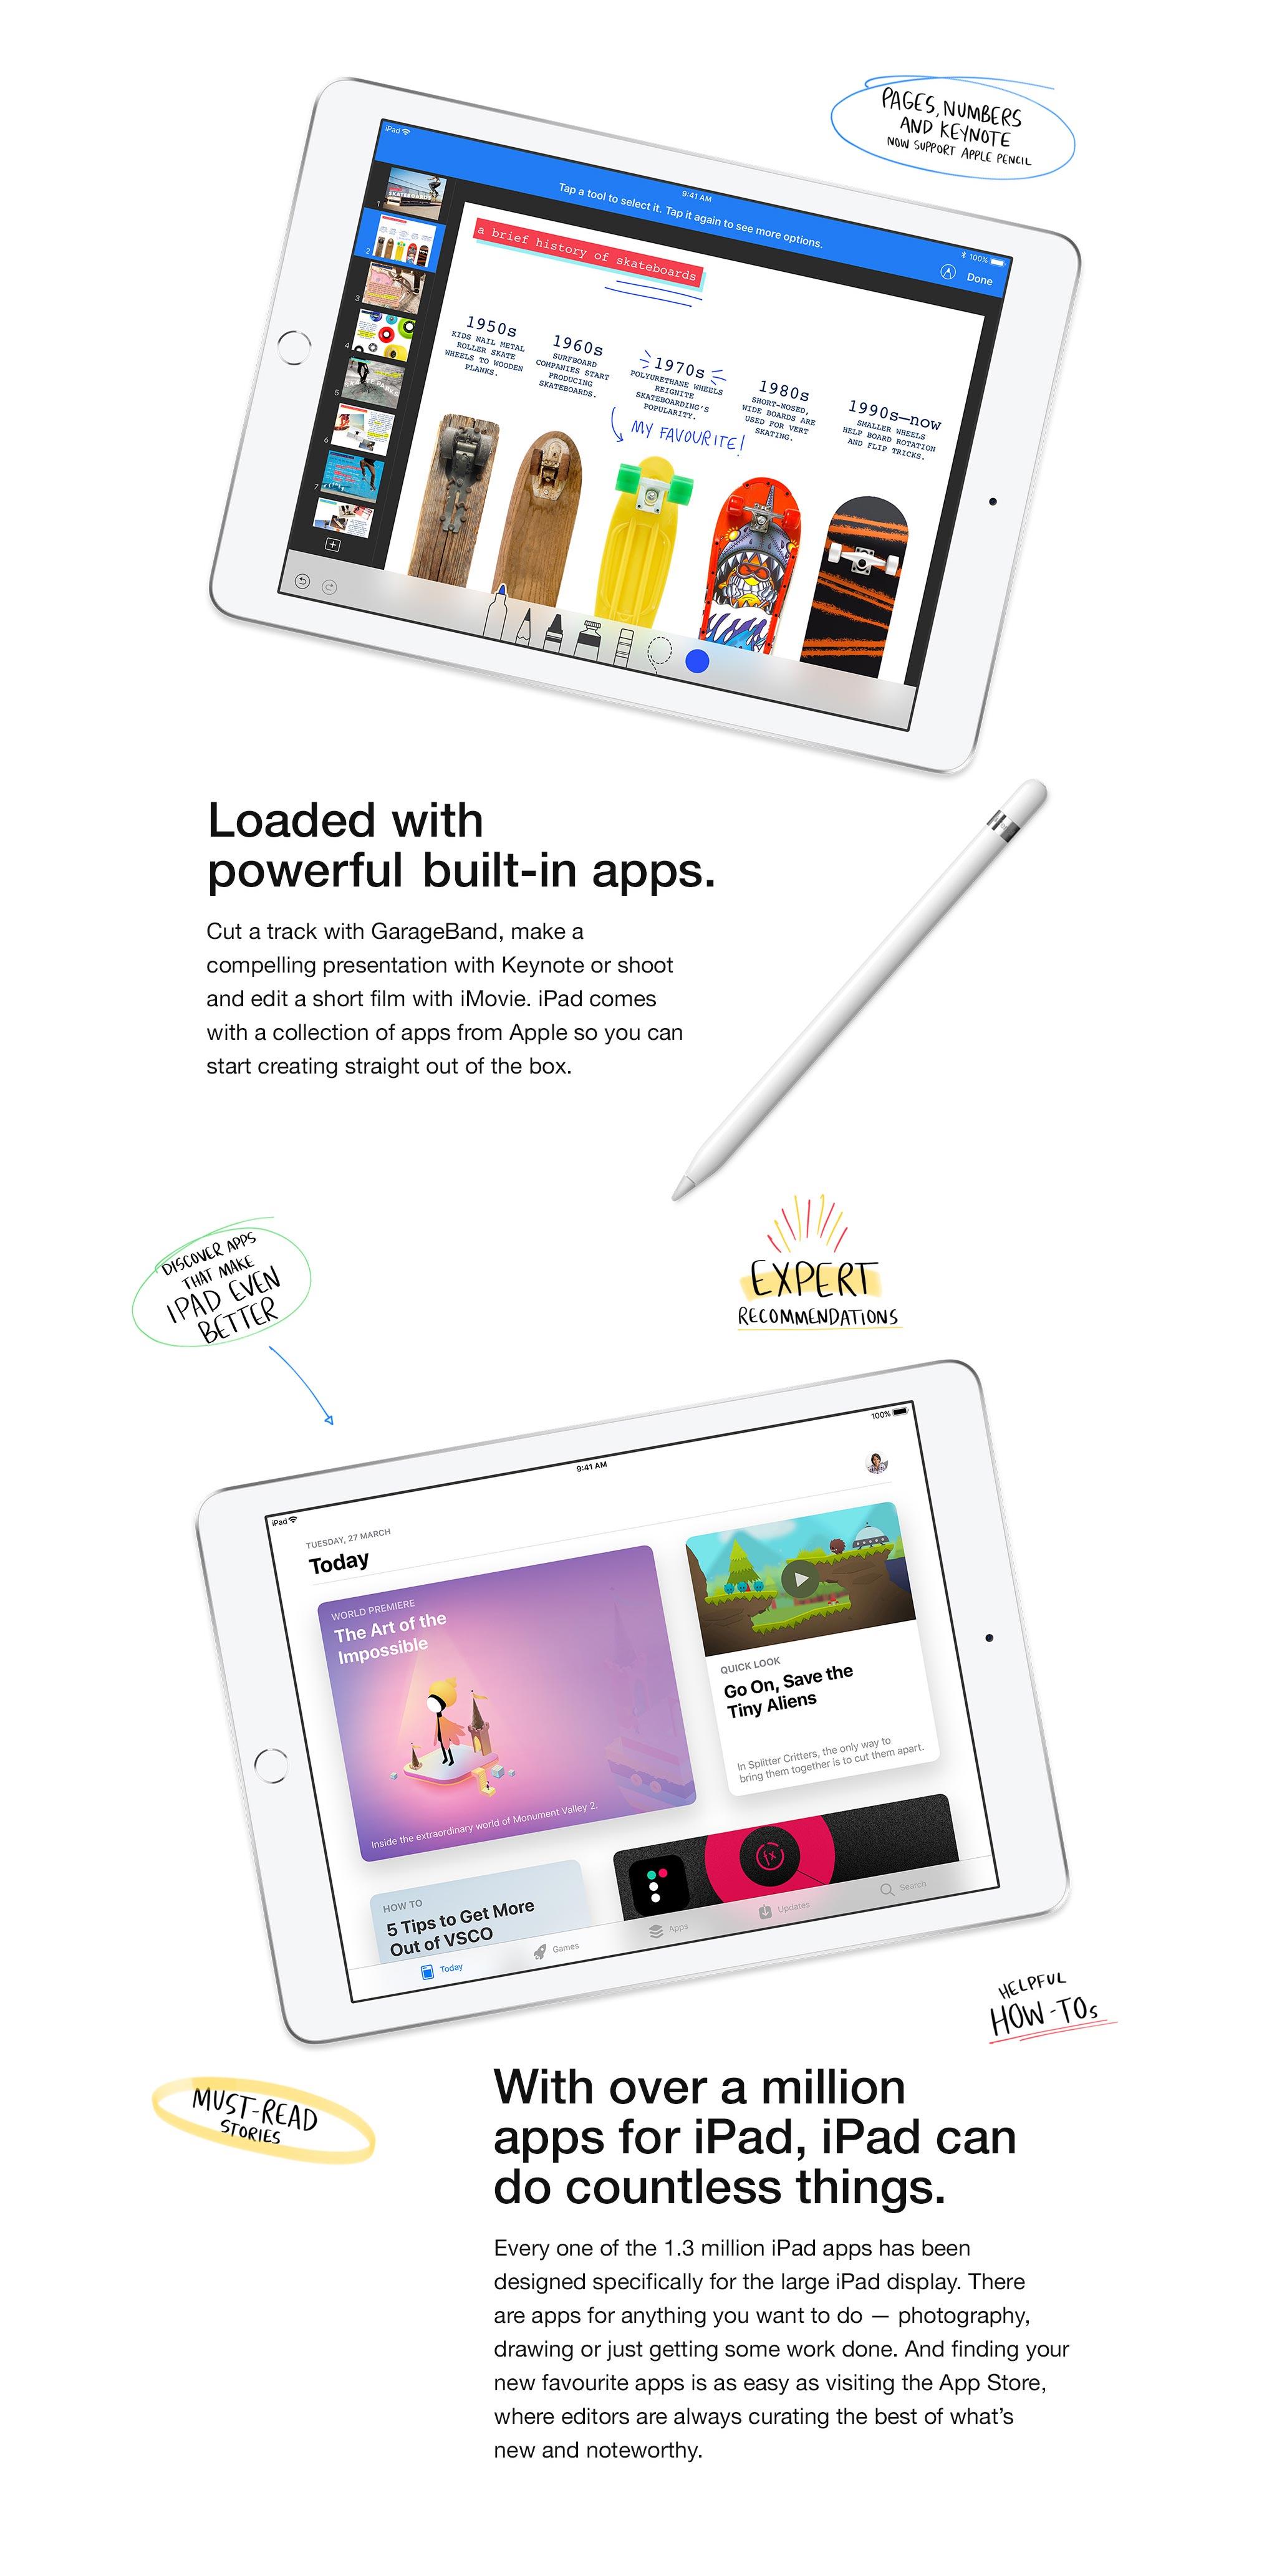 9 7-inch iPad | StarHub Singapore